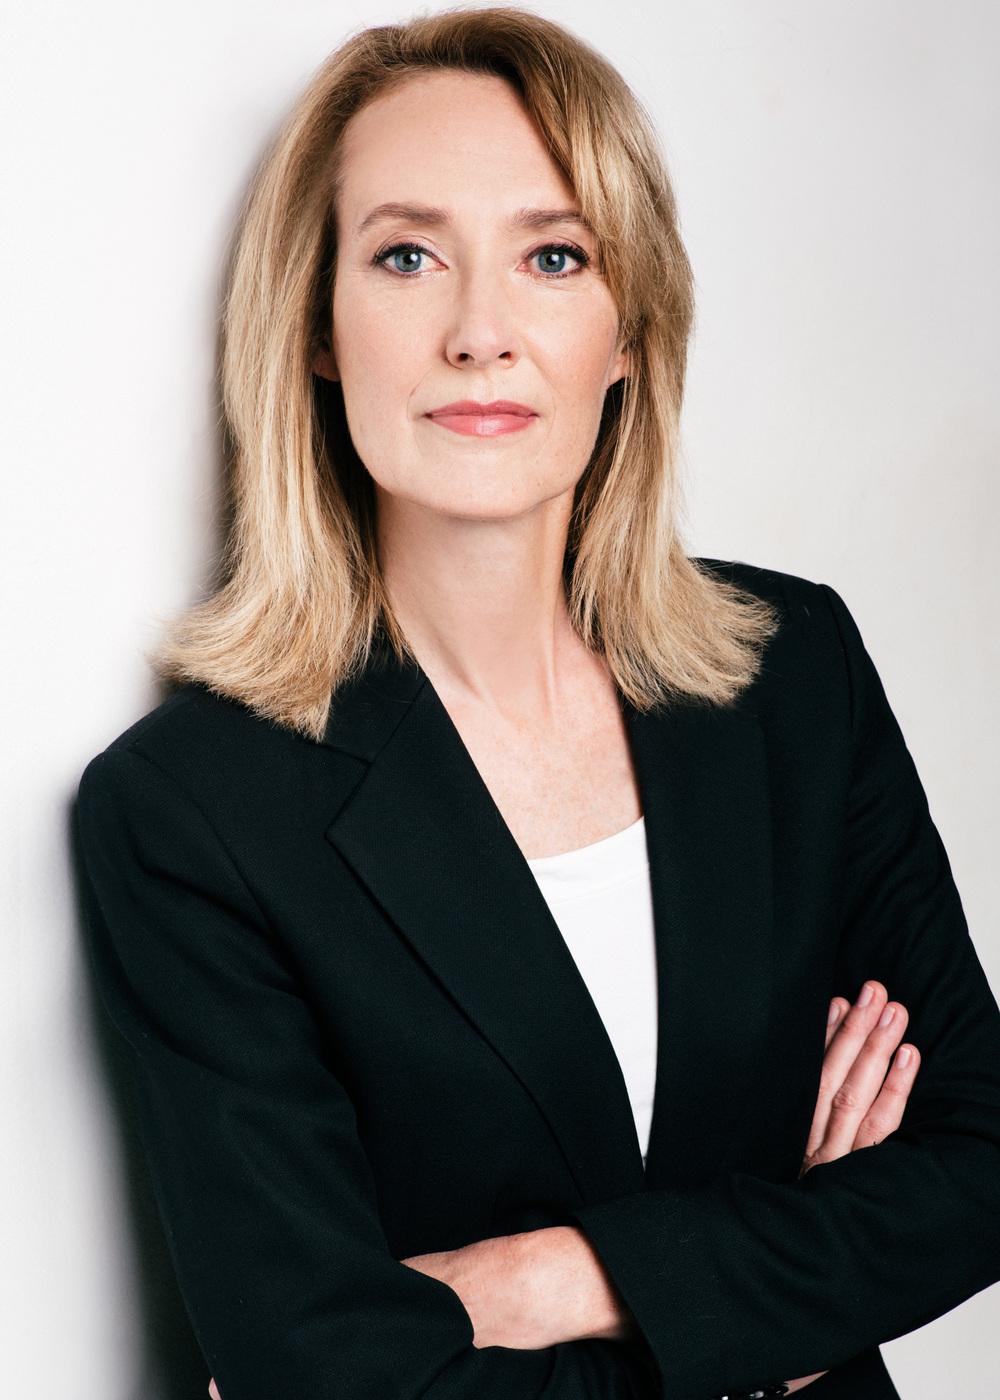 CEO-portrait-corporate-headshot-02.jpg